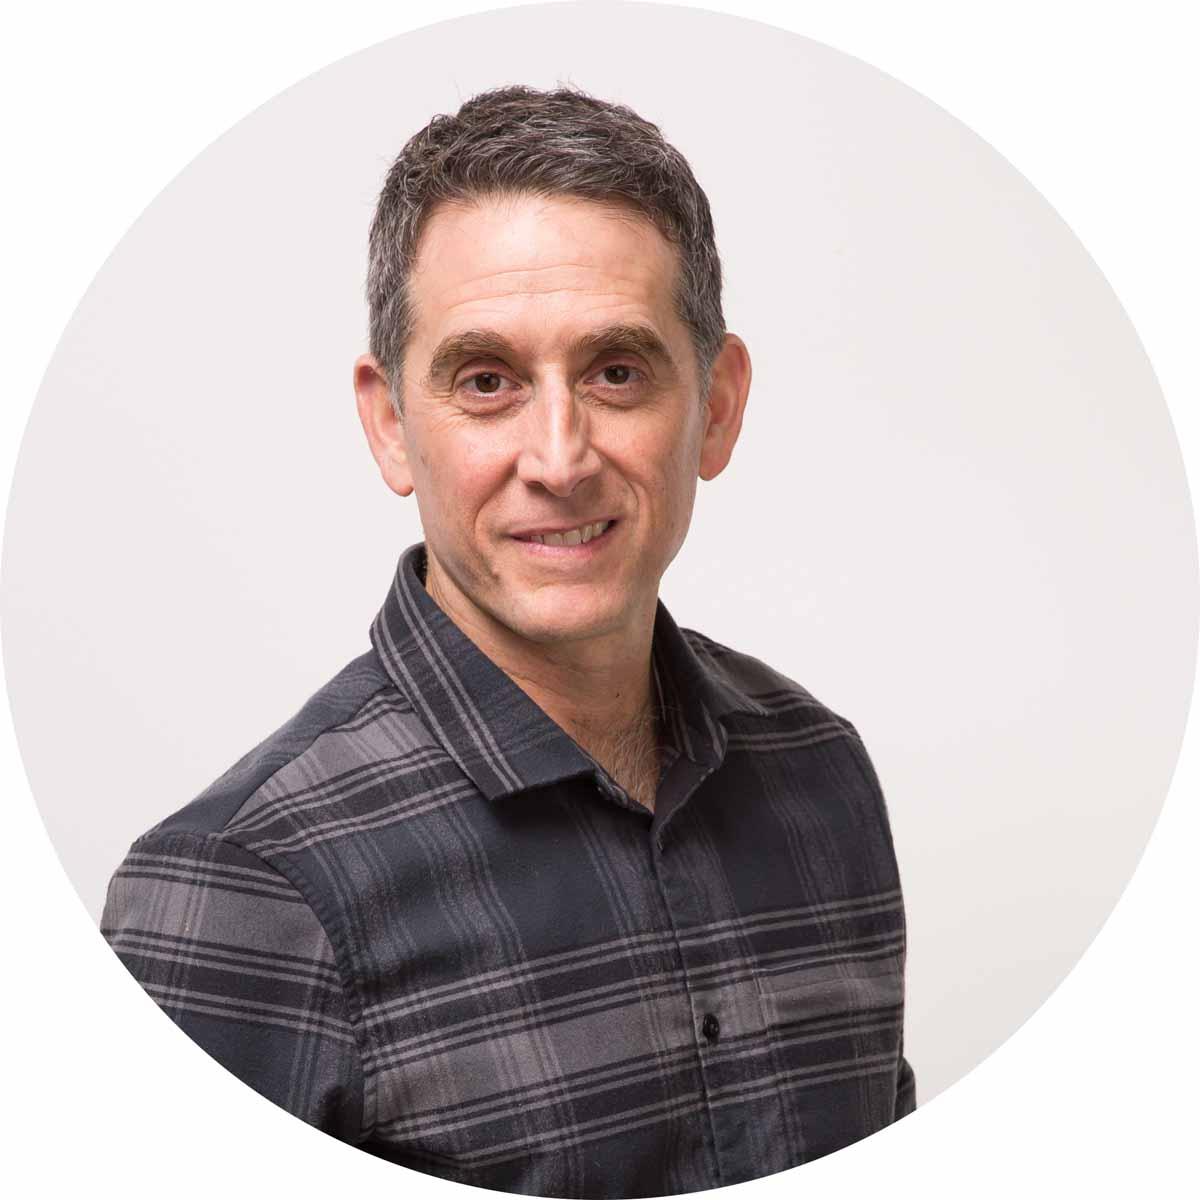 photo of Doctor Dan Rubin